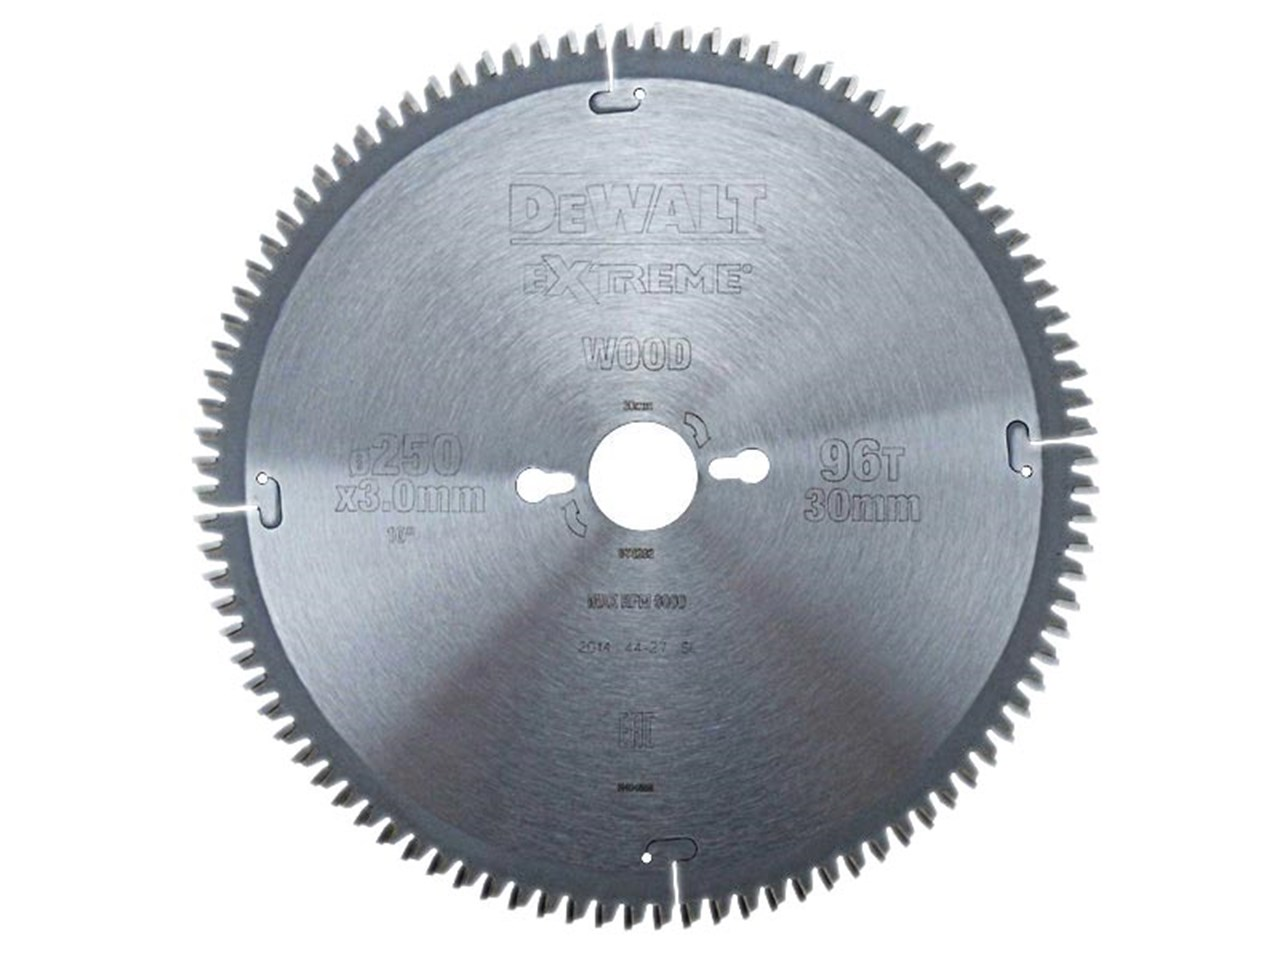 Dewalt dt4282 250mm x 30 x 96t extreme mitre saw blade greentooth Images